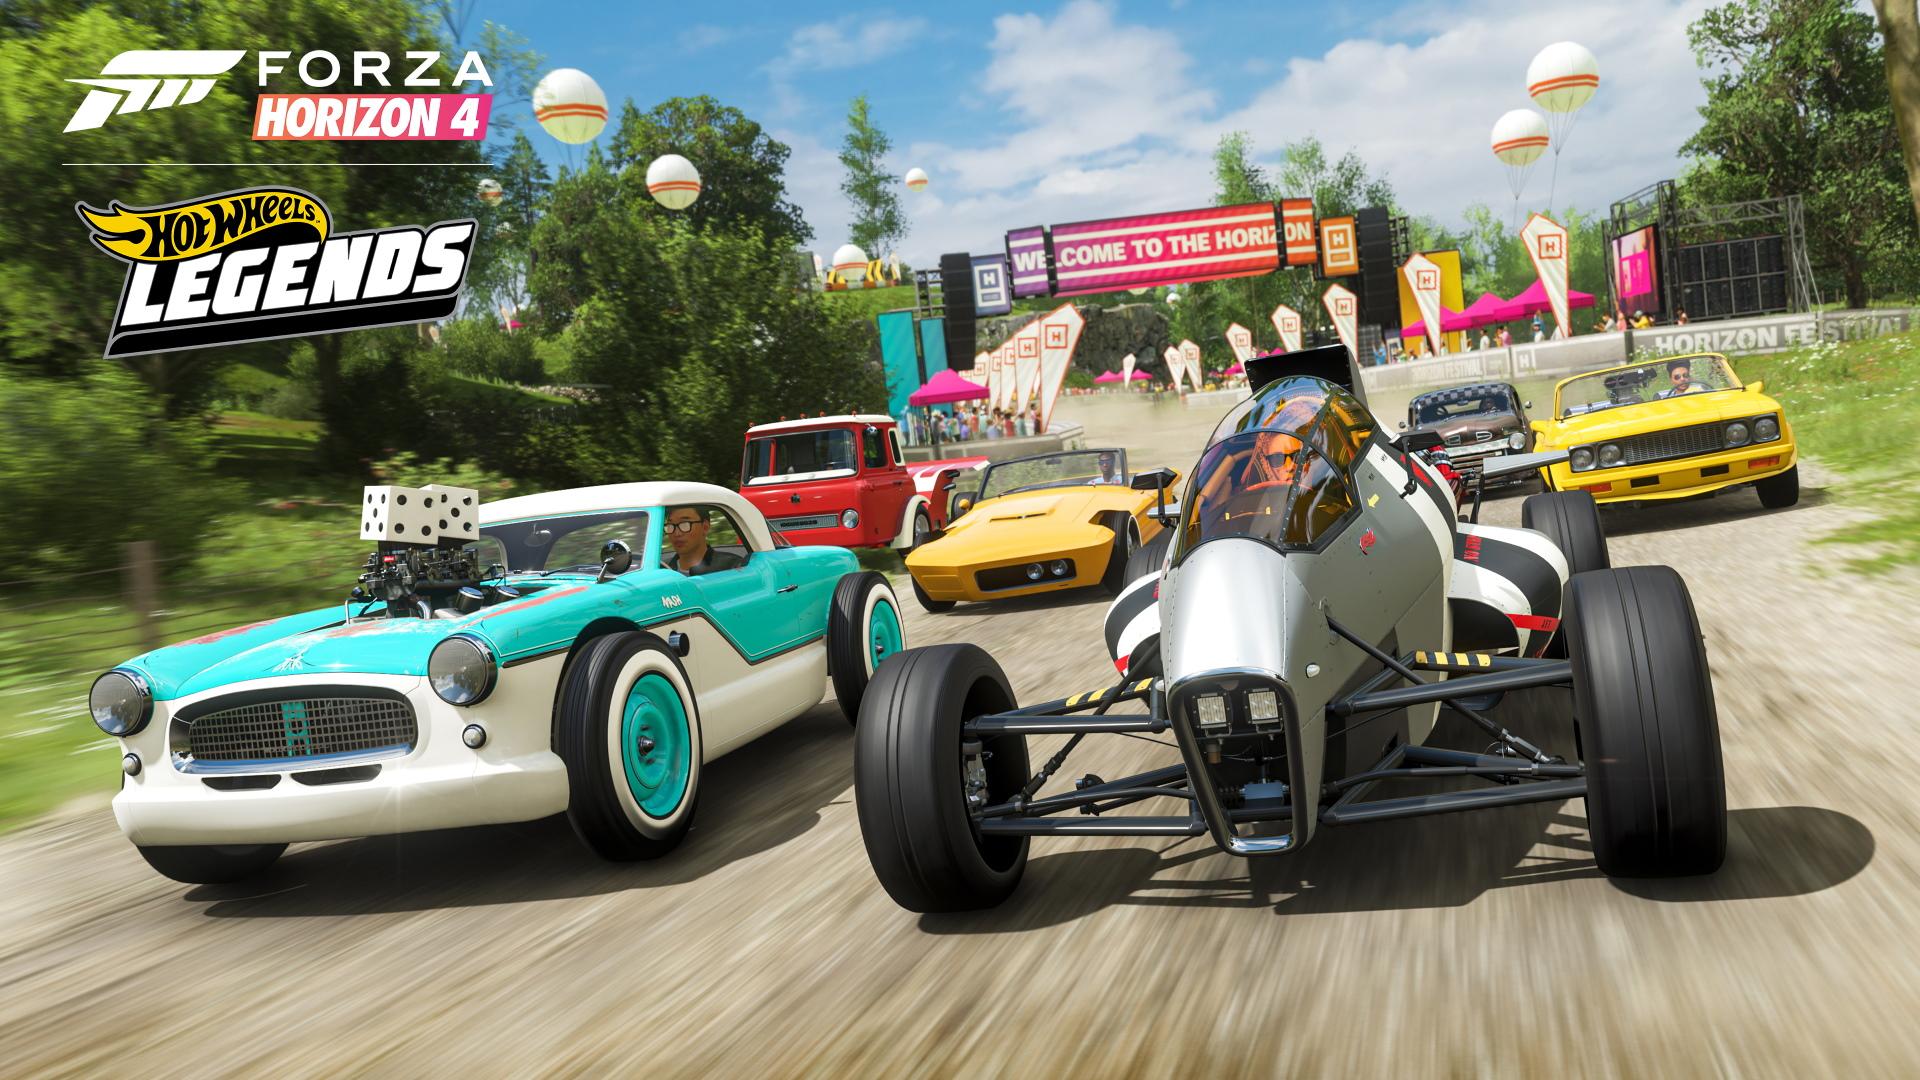 Forza Horizon 4 Hot Wheels Legends